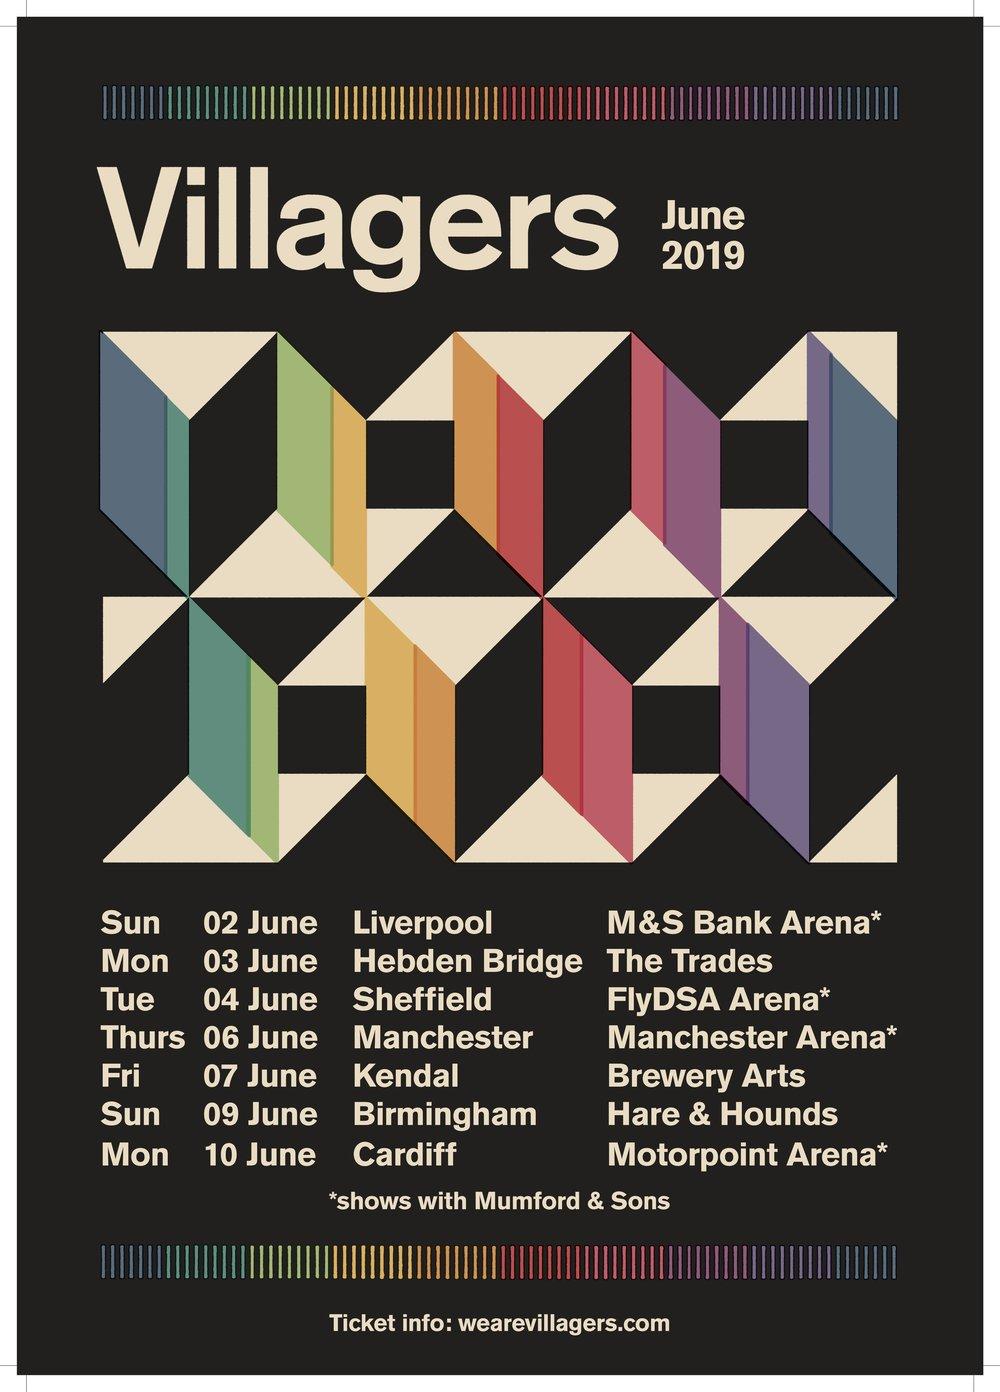 Villagers-TourJune2019-Poster.jpg